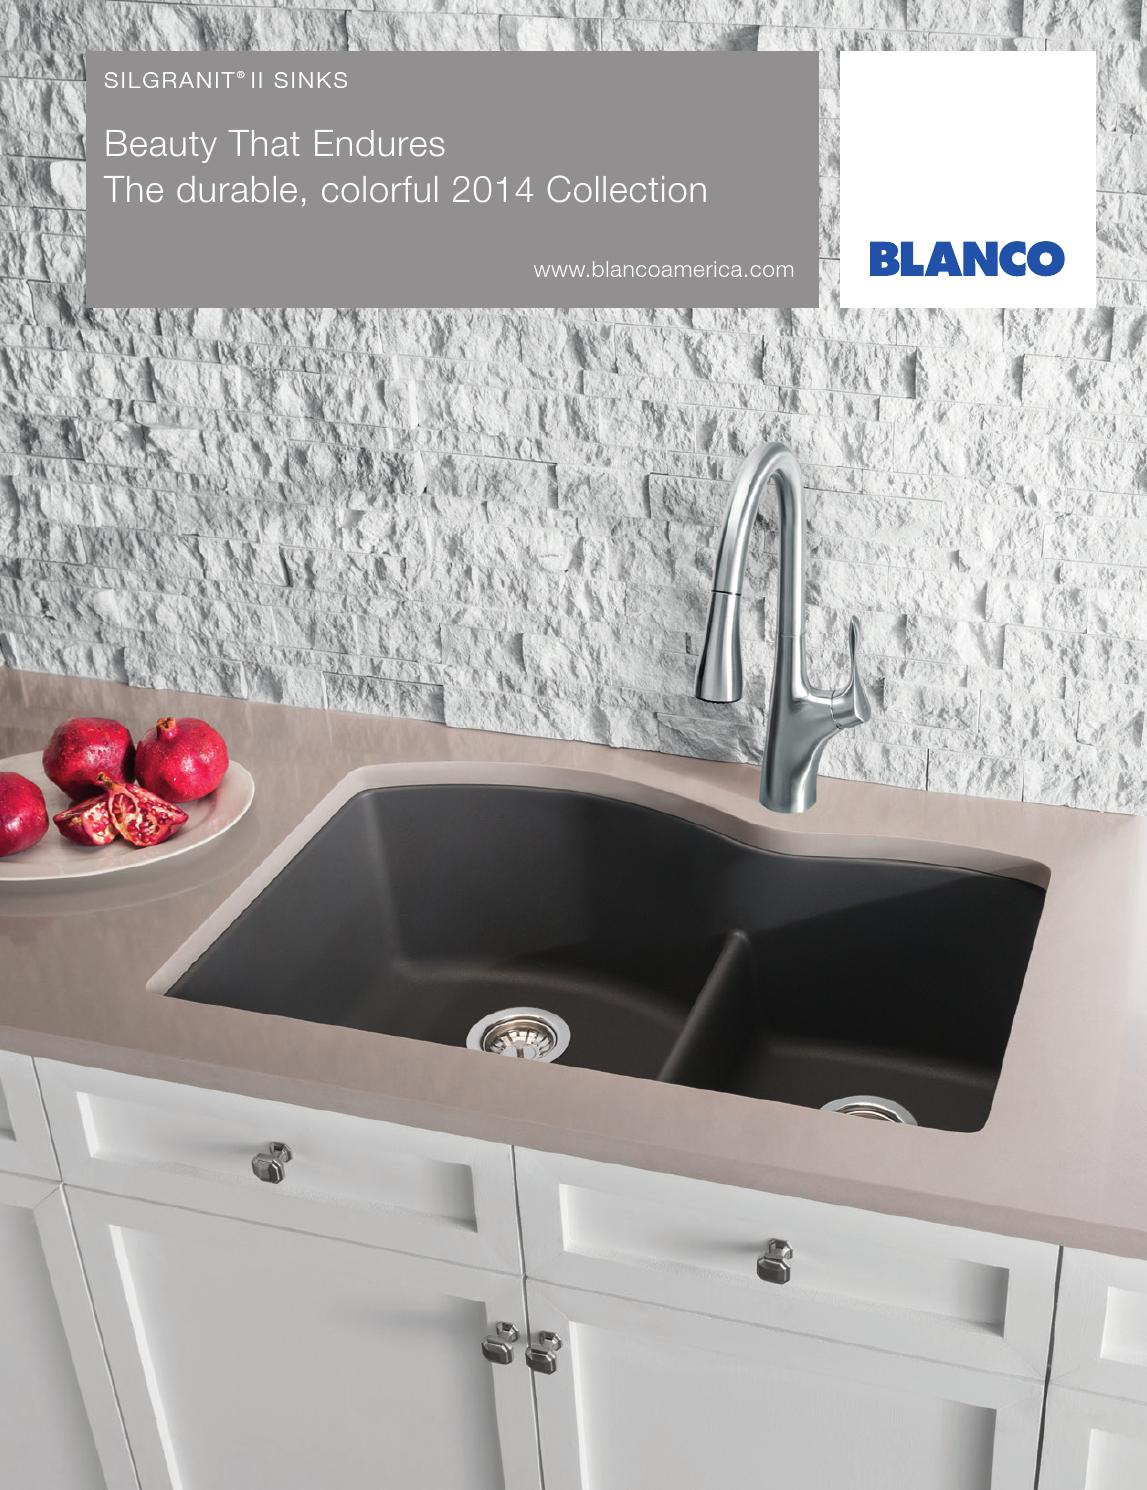 blanco catalog blanco kitchen sinks